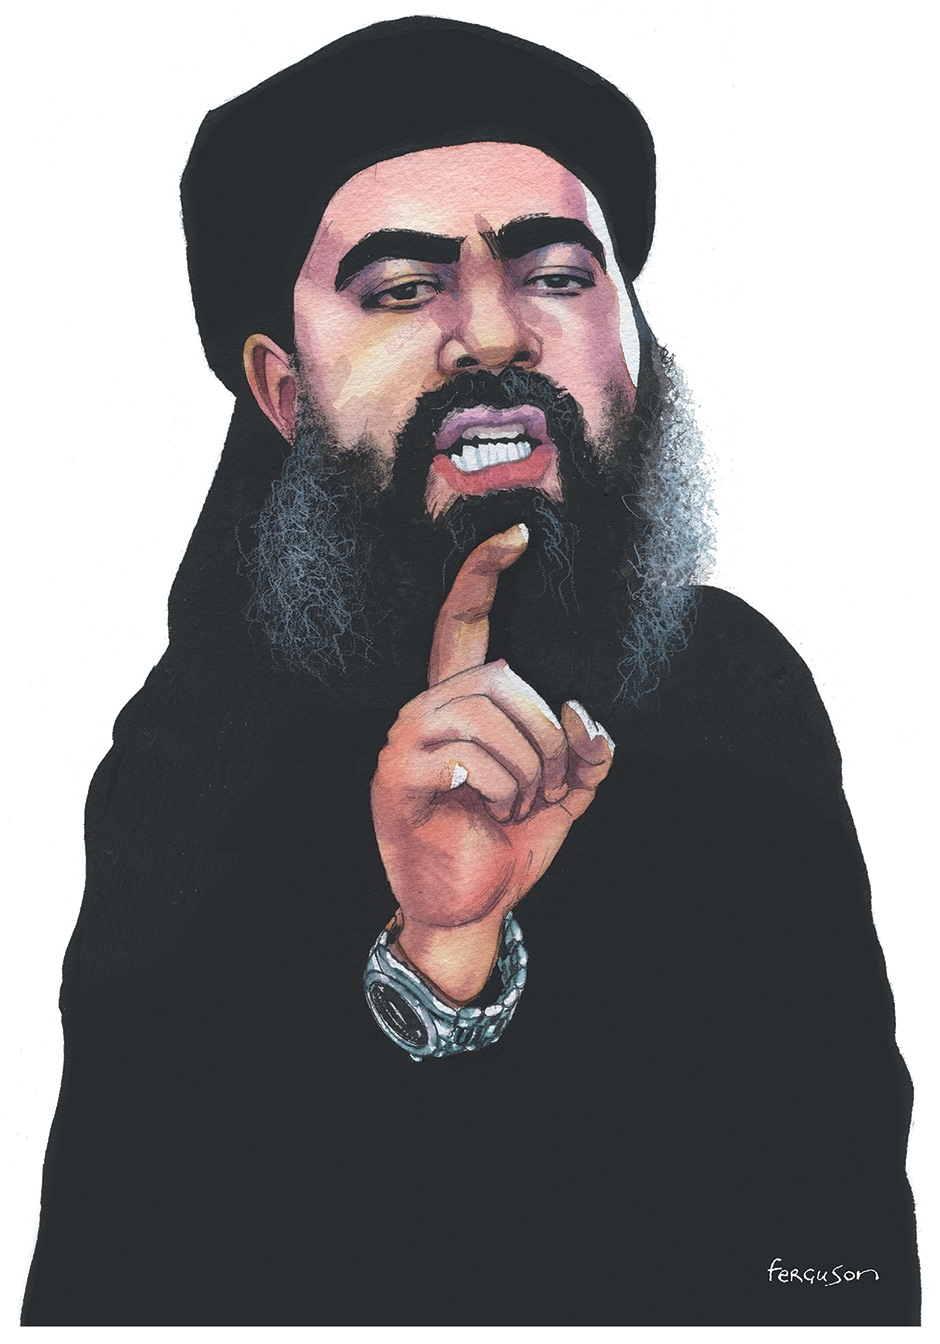 image Abu bakr al baghdadi